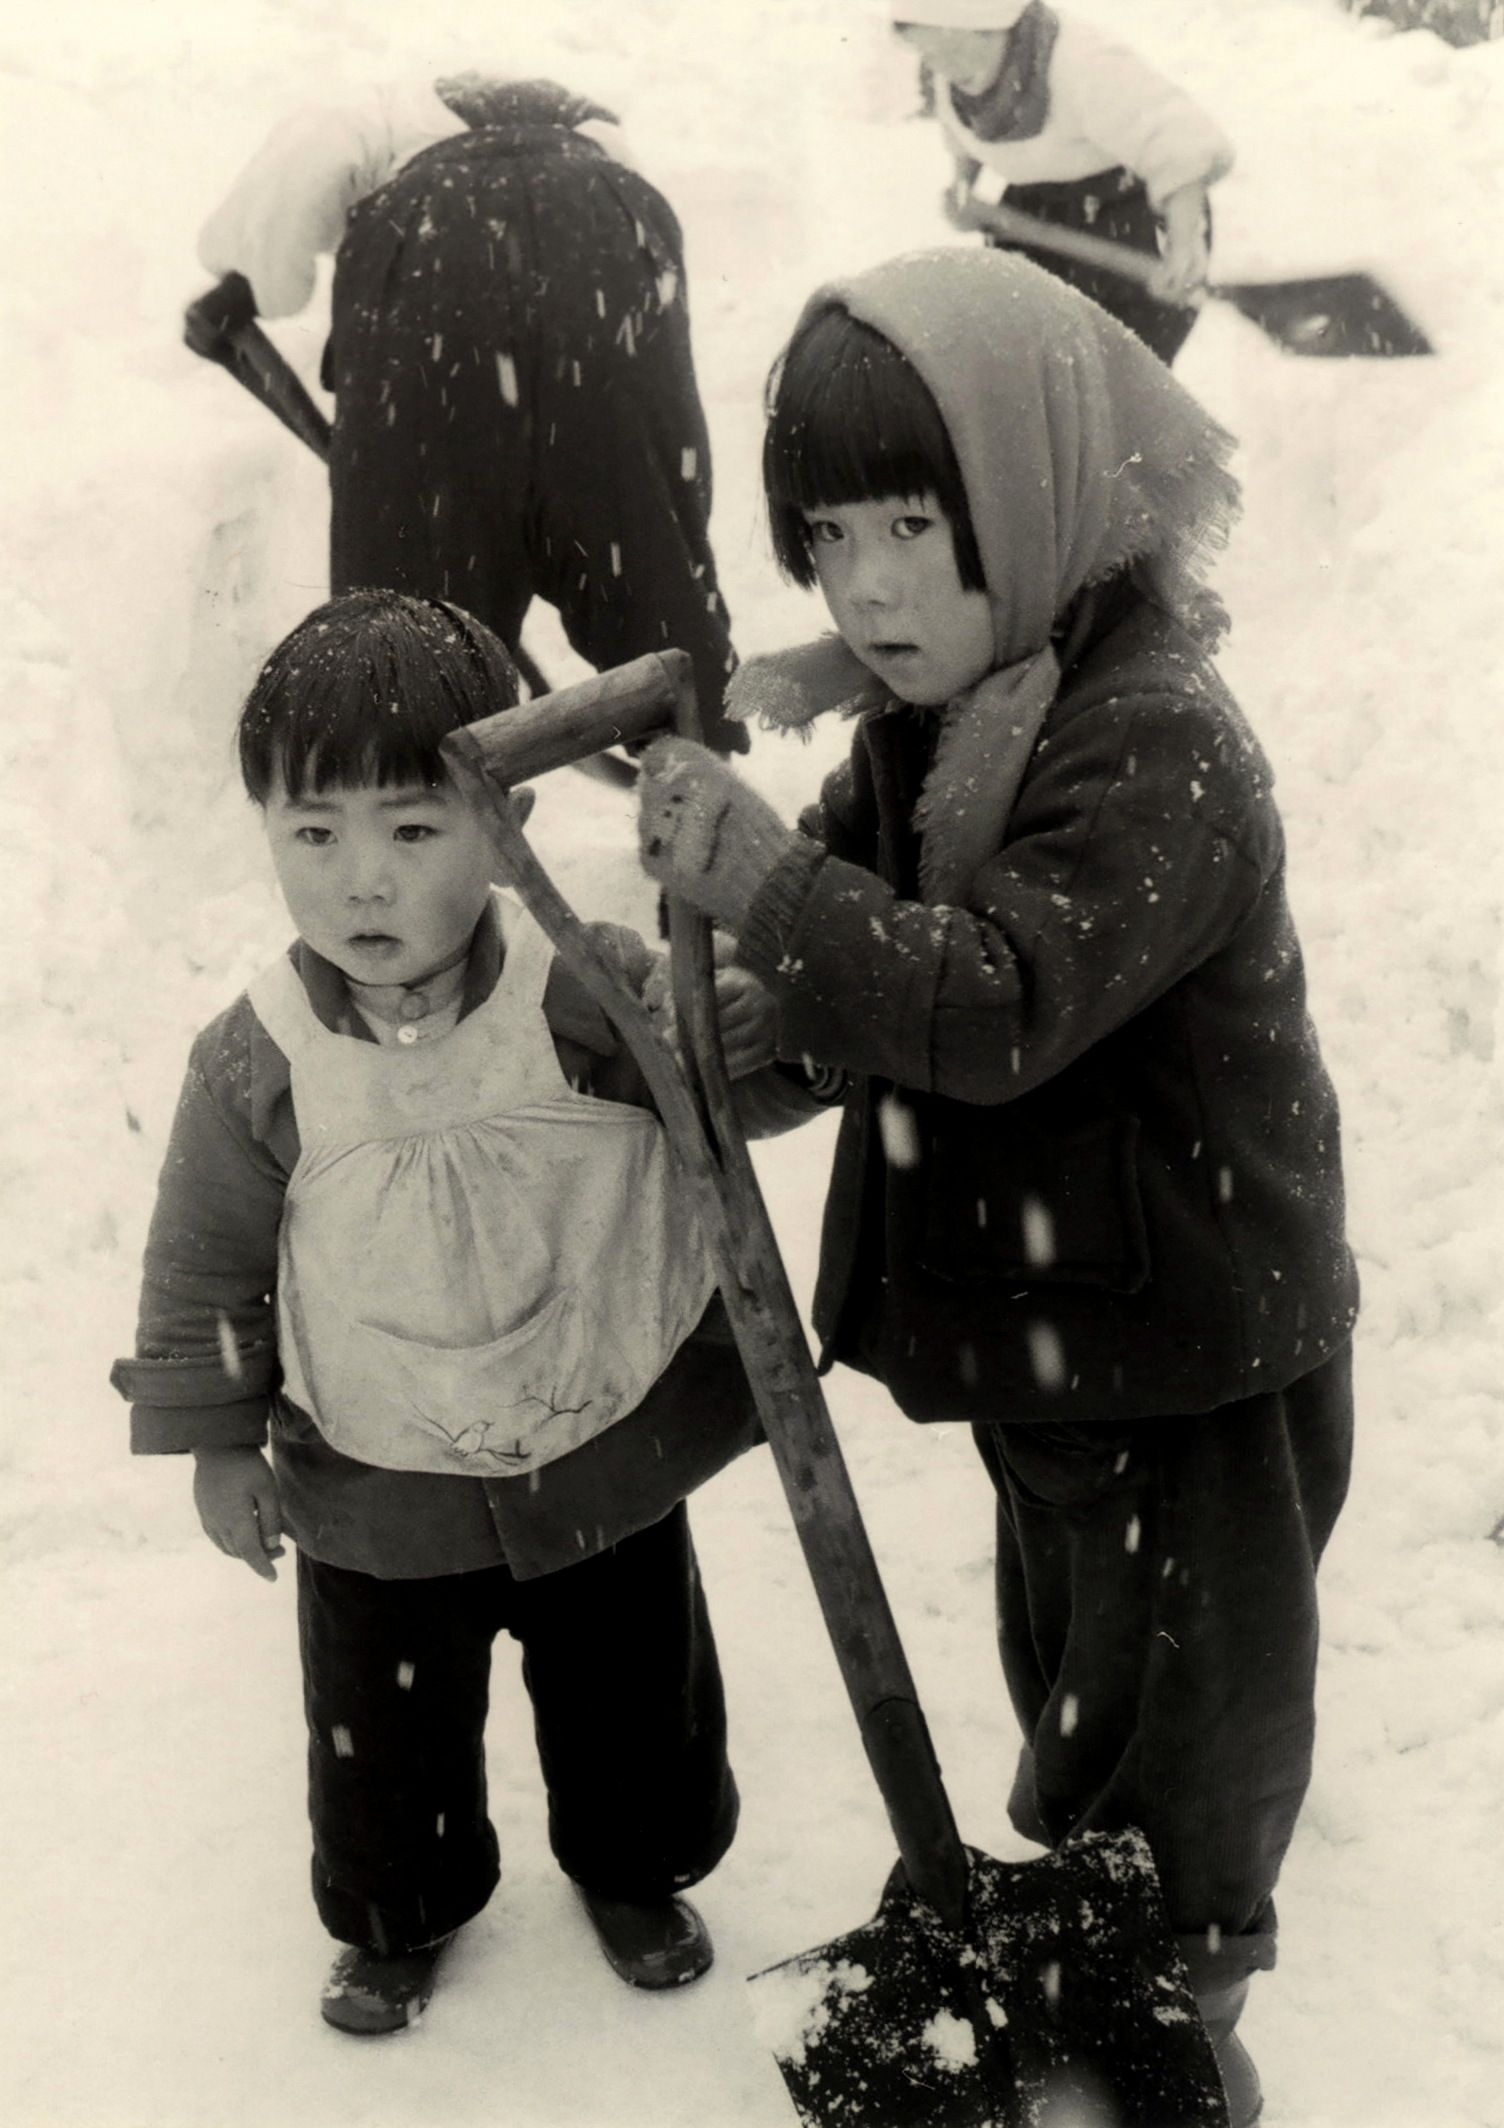 Clear A Path At Snow Takayama 1956 By Kansuke Yamamoto Japan Mizuworld Japanese Photography Japanese History Japanese Culture